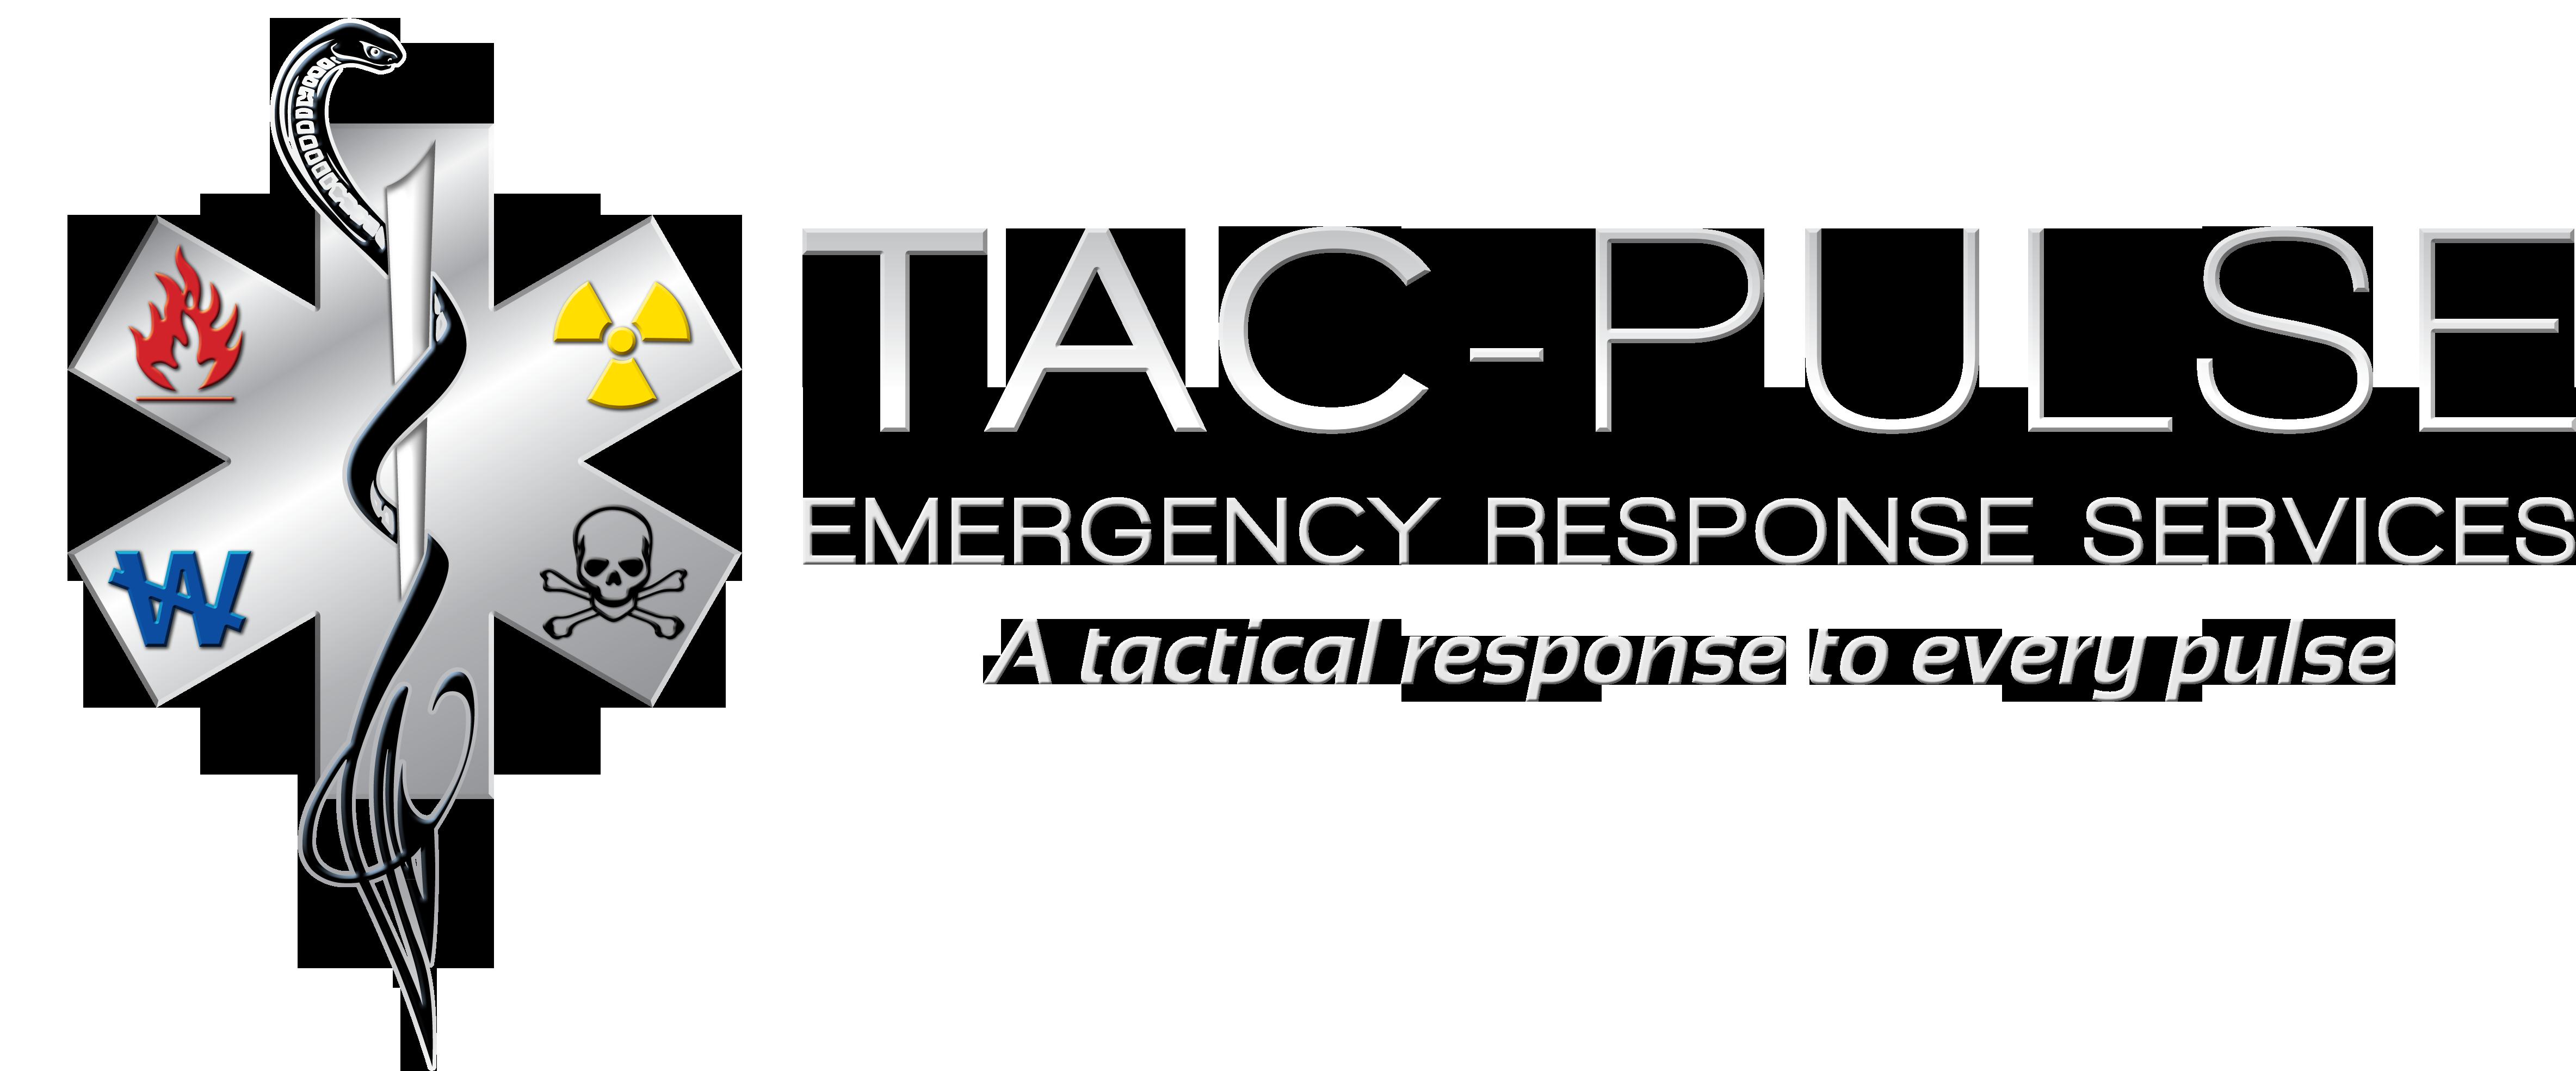 Tac-Pulse ERS